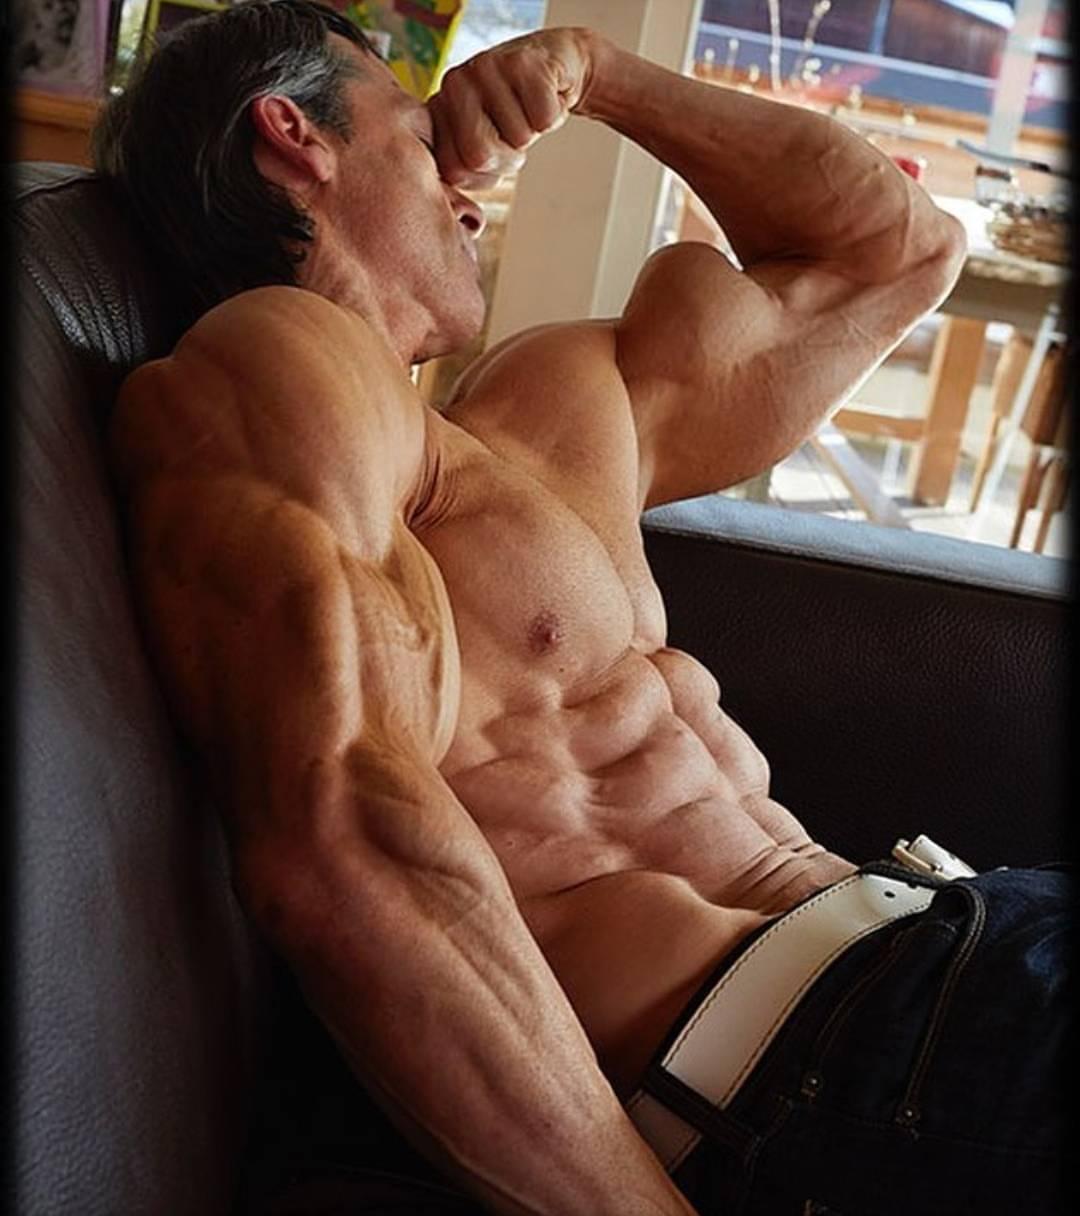 Helmut strebl the most shredded man alive! workout and diet revealed